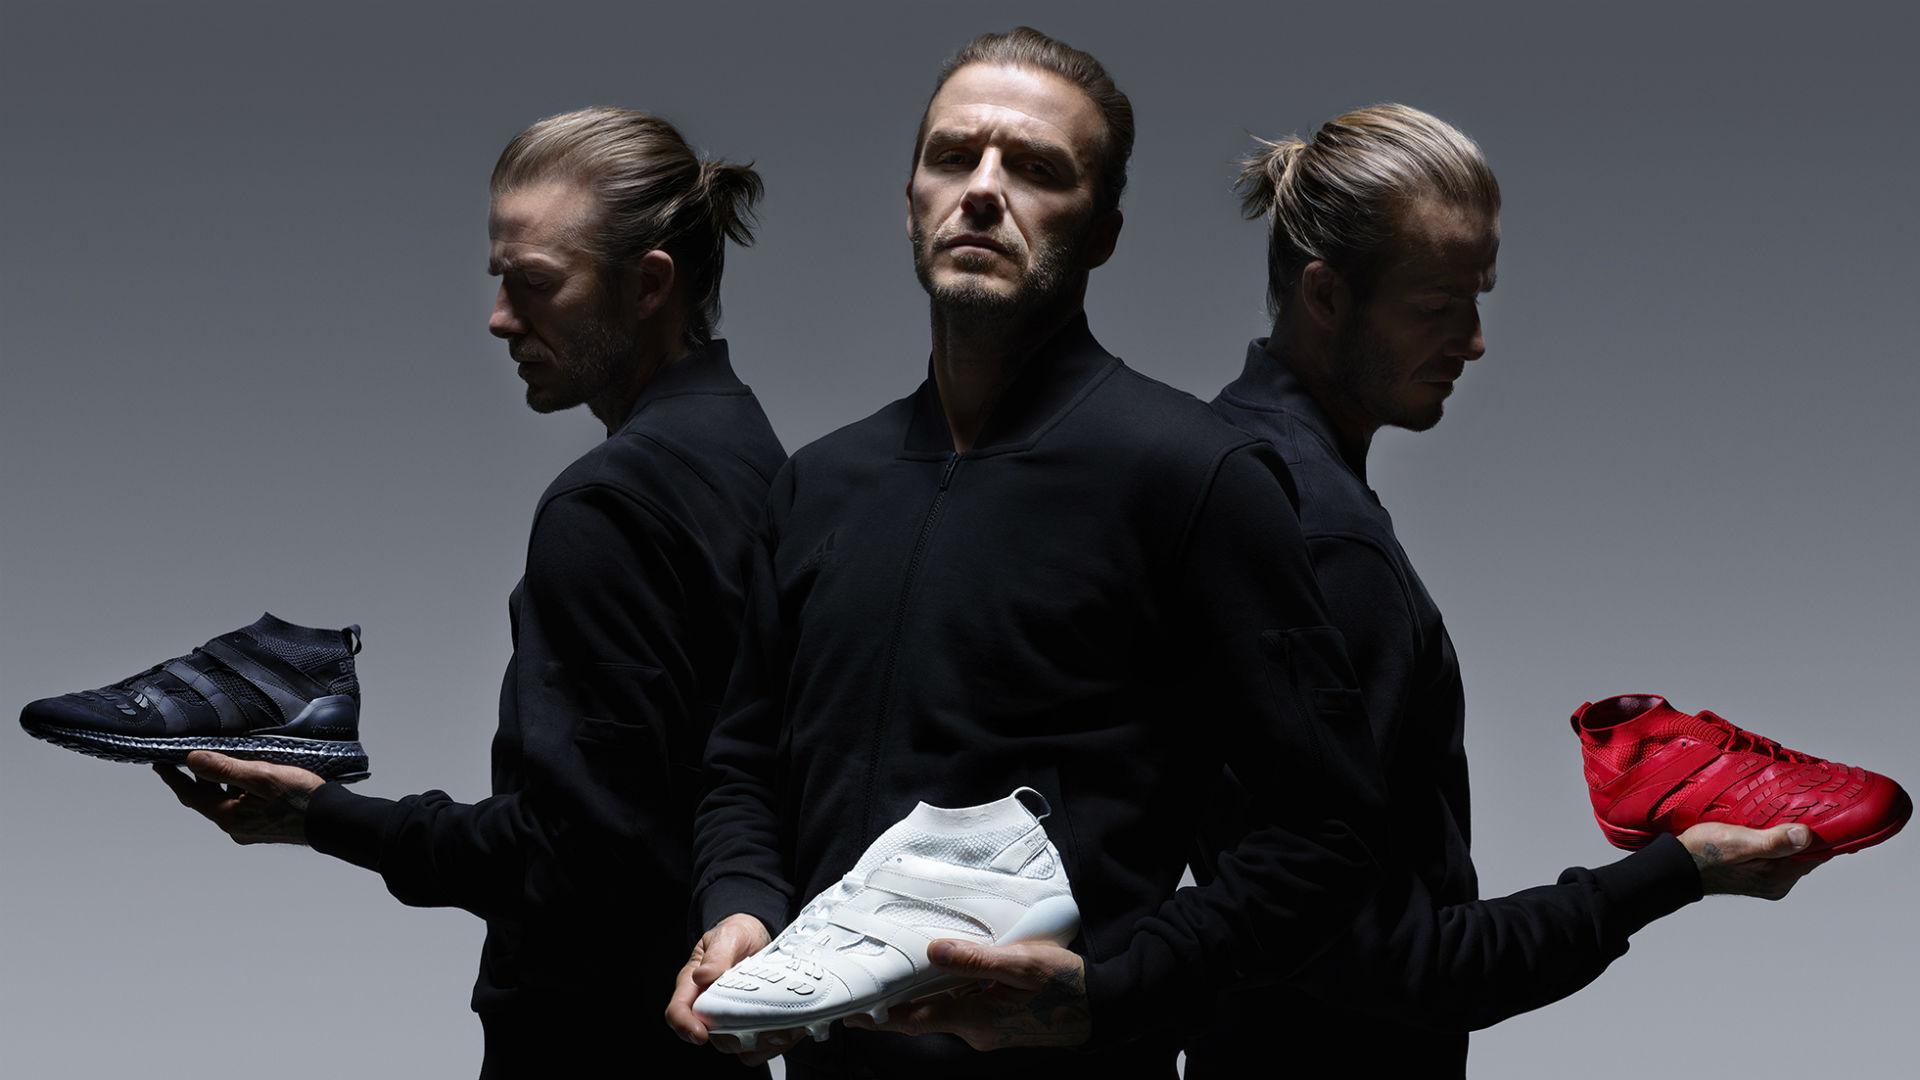 Adidas David Beckham Capsule Collection: Former Man Utd star